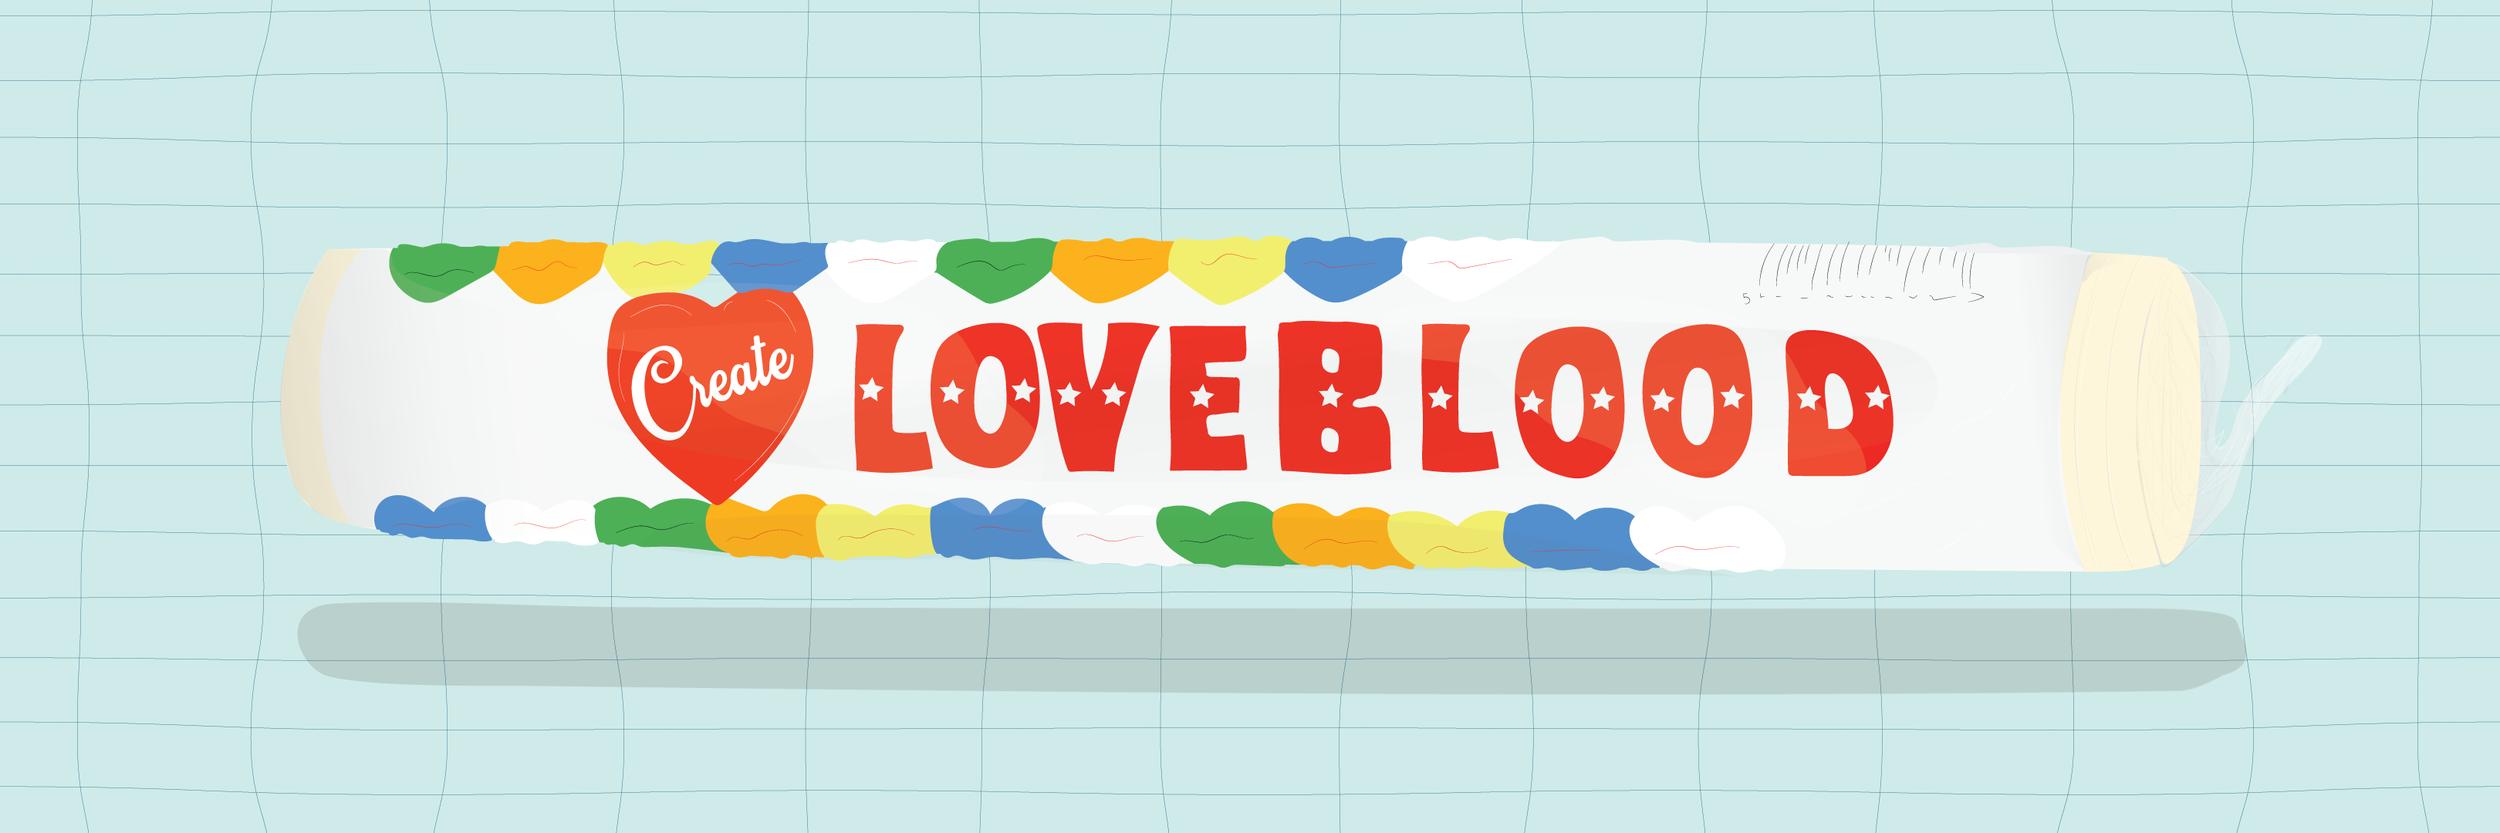 LovebloodInstagramPicture.png